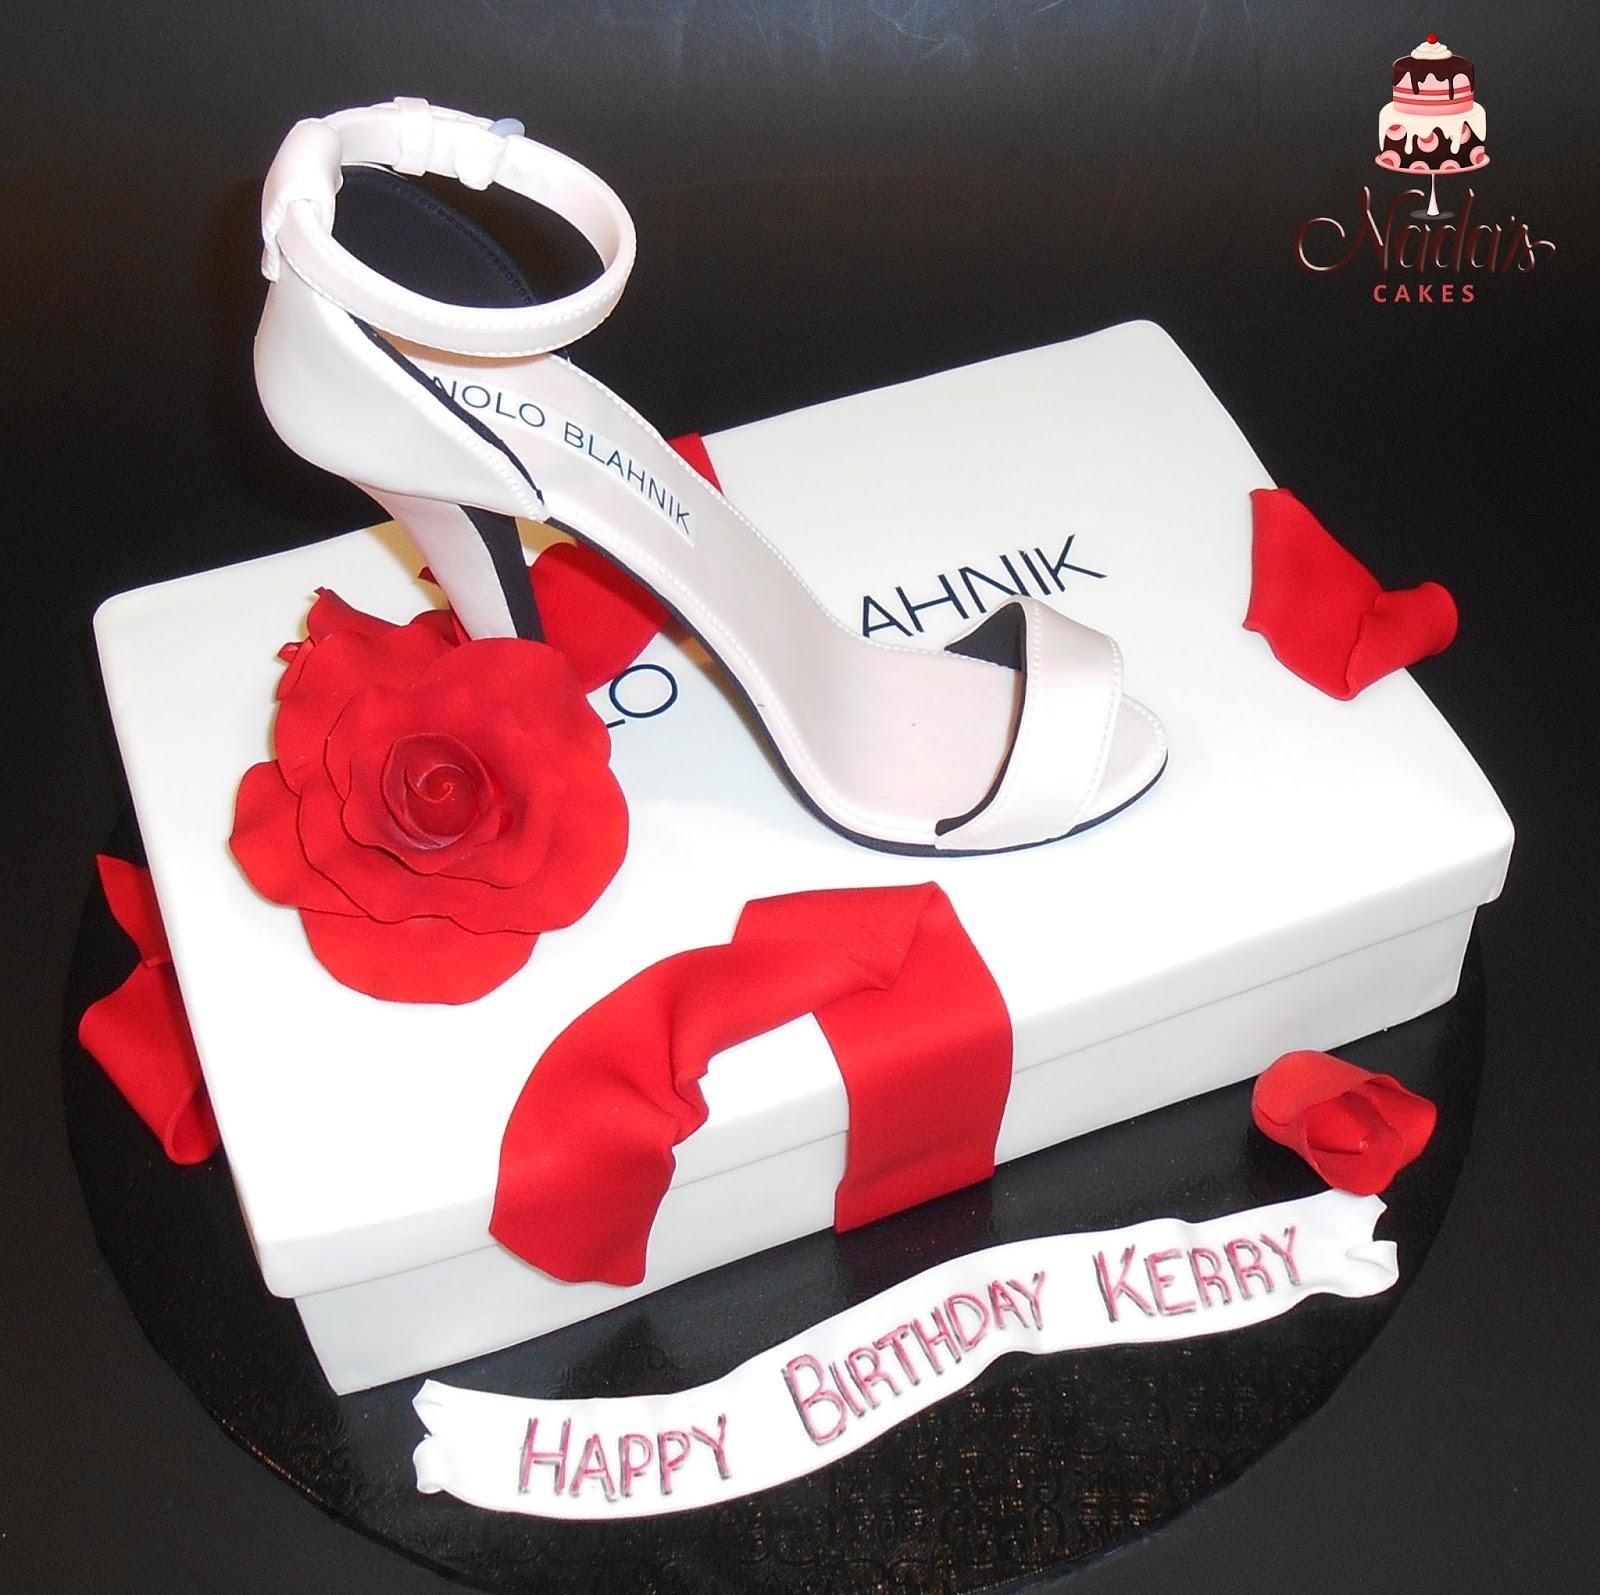 Sensational Nadas Cakes Bahnik Stiletto Birthday Cake Funny Birthday Cards Online Kookostrdamsfinfo